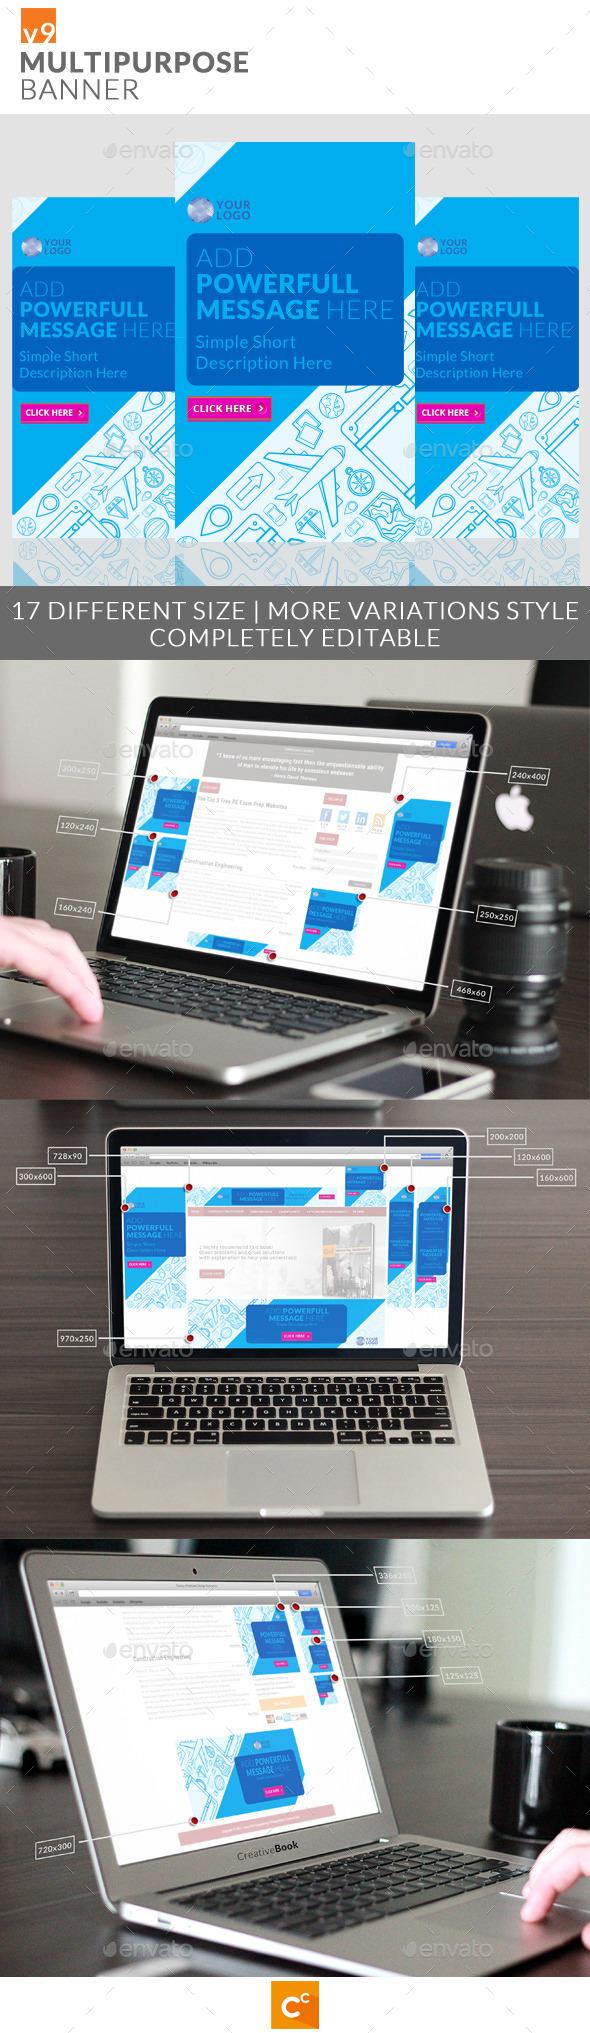 GraphicRiver Multipurpose Banner Ads v9 11093053